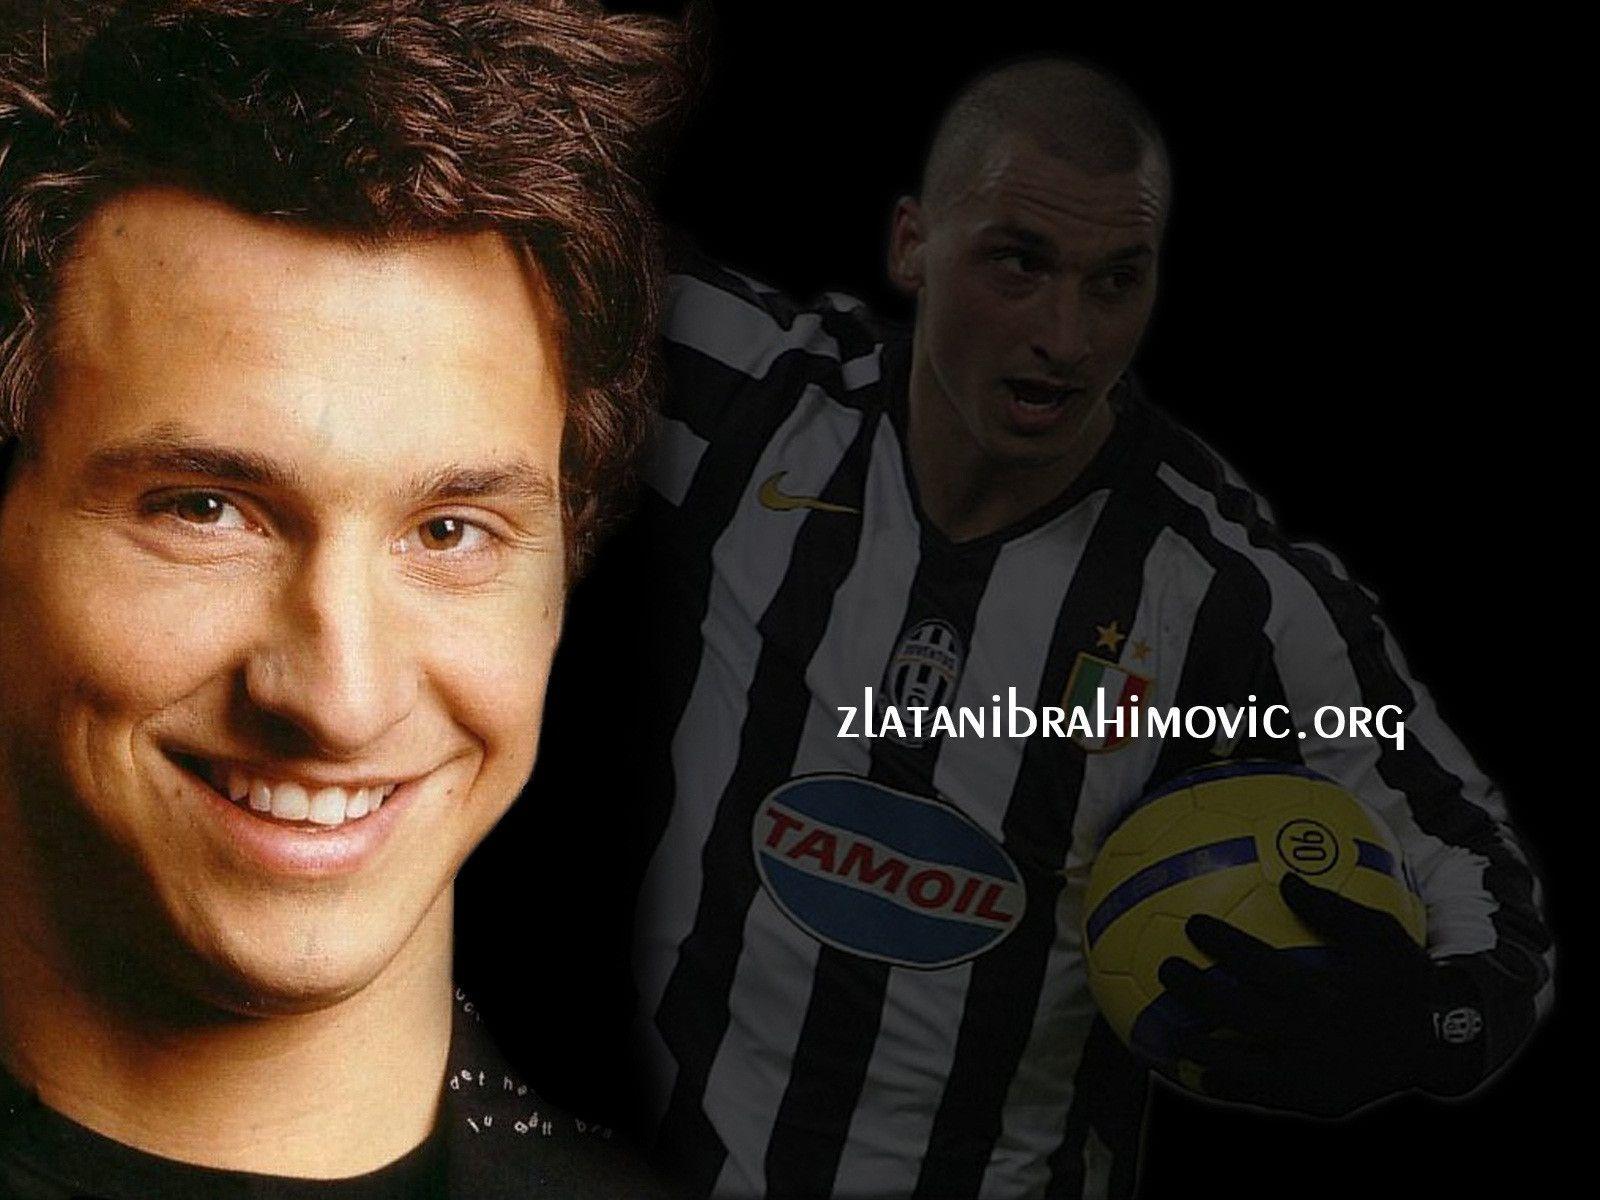 Zlatan Ibrahimovic #1243 / Football / Desktop HD, iPhone, iPad ...